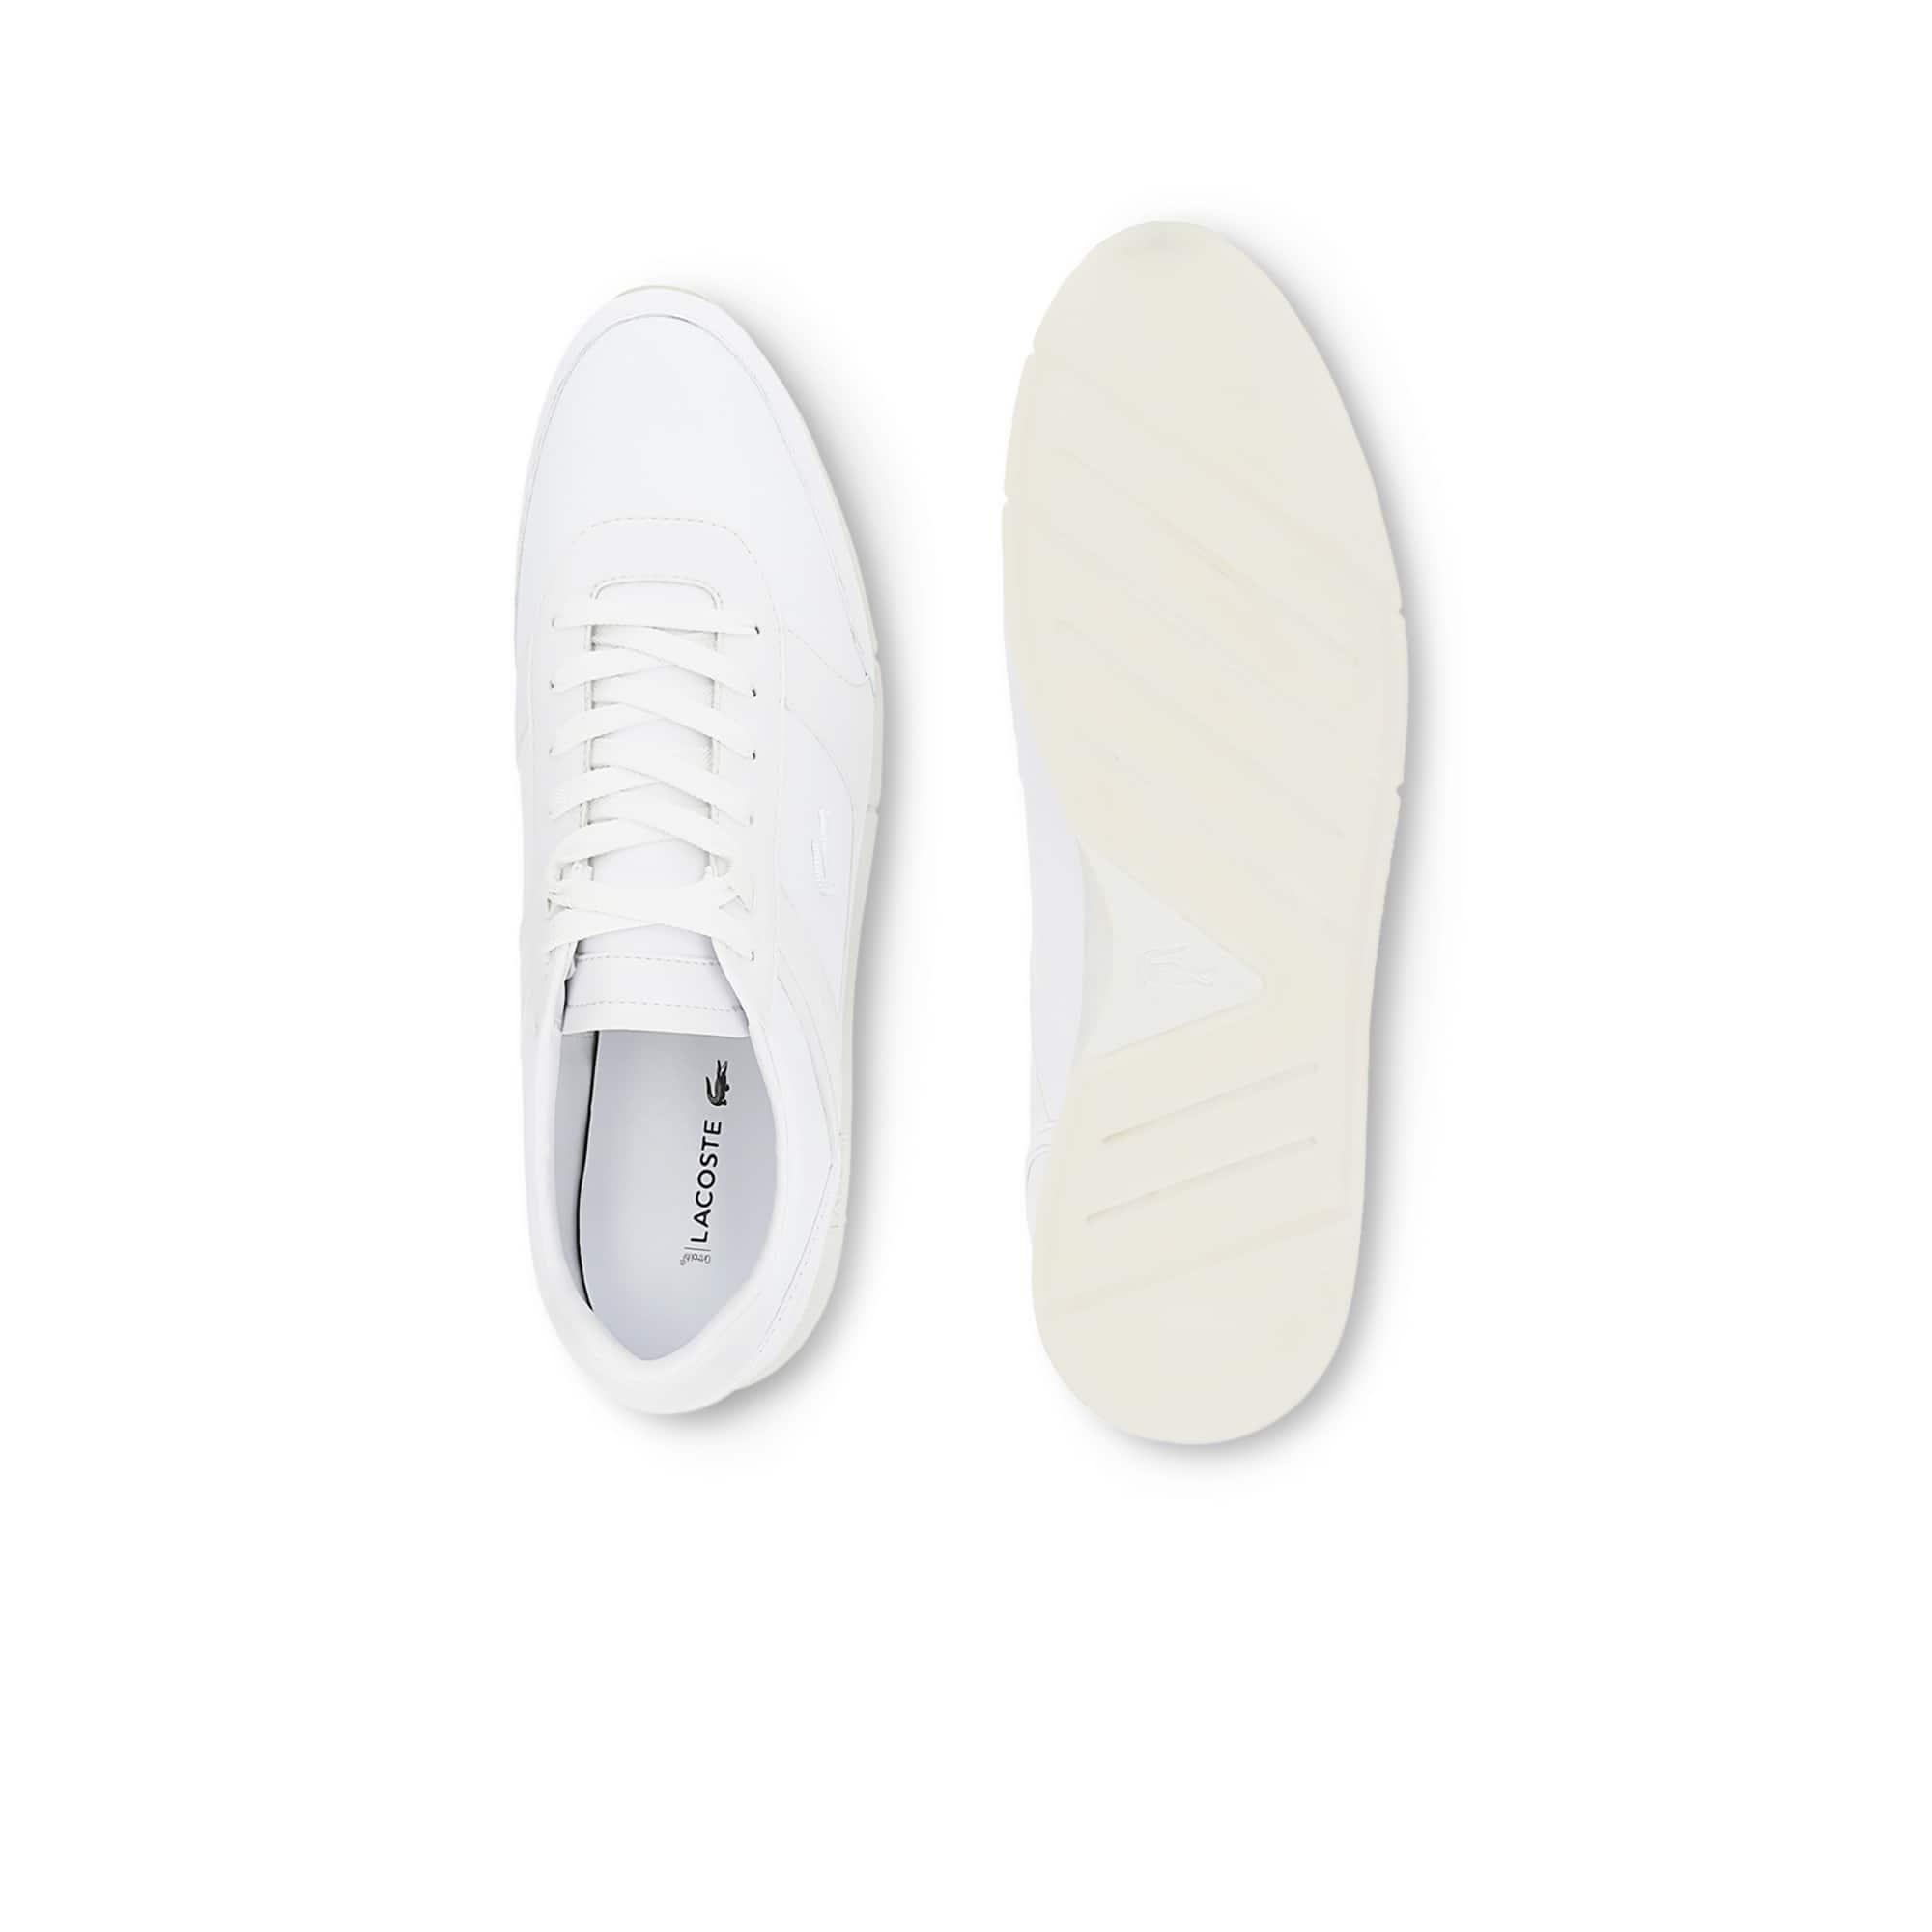 En Menerva Homme Sneakers Lacoste Cuir vq6p61wY